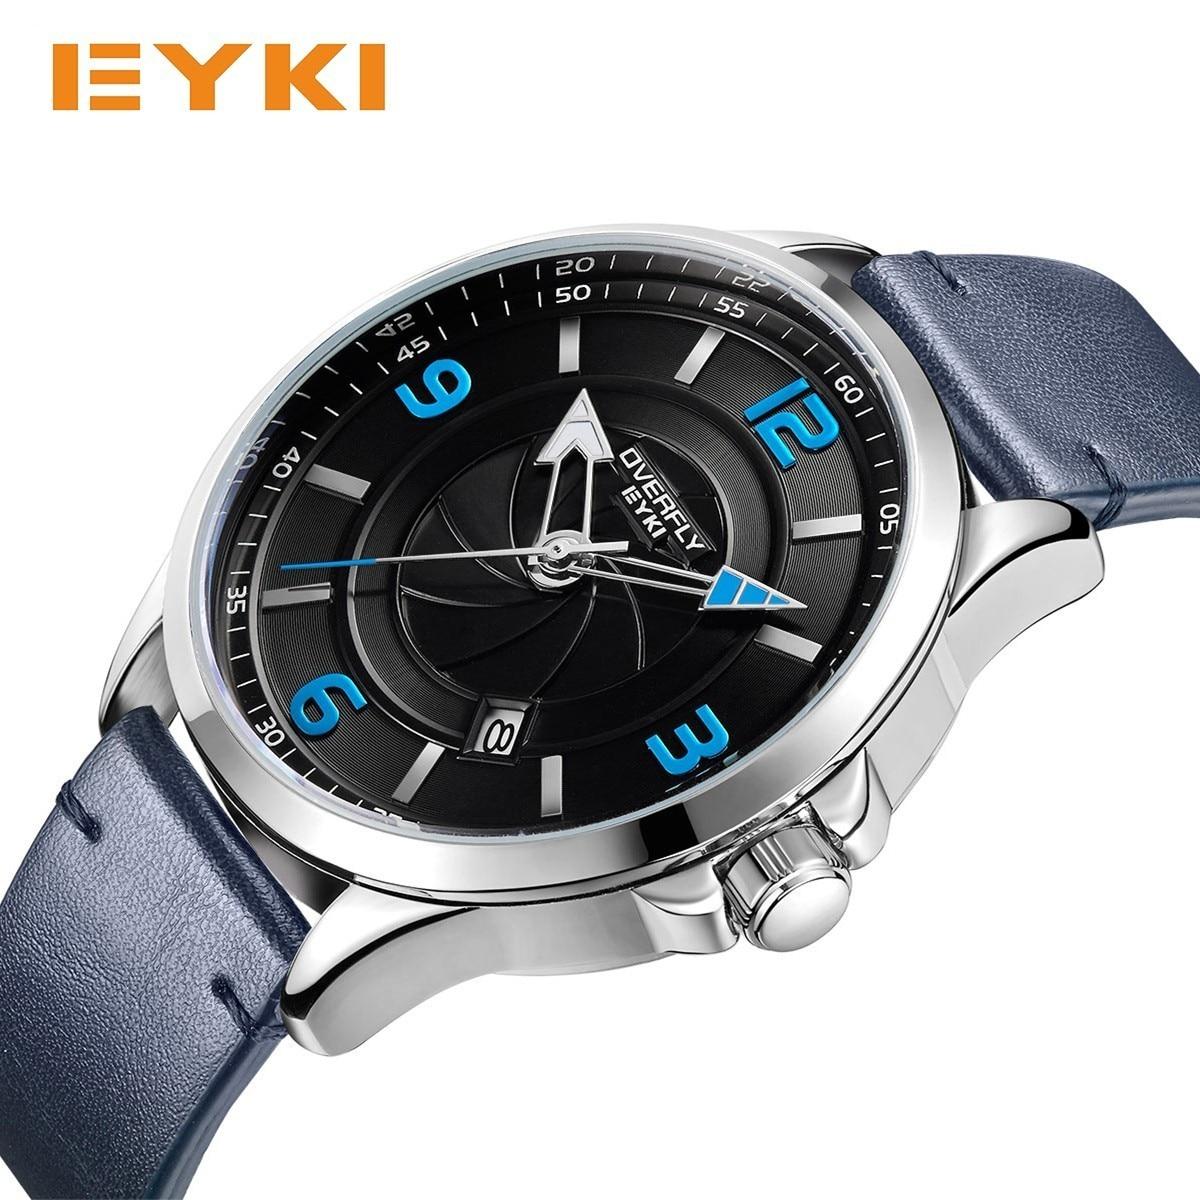 EYKI Mens Watches Blue Glass Camera Lens Dial Luminous Hands PU Leather Watch Strap Quartz Luxury Watch Men Fashion Brand Clock цены онлайн